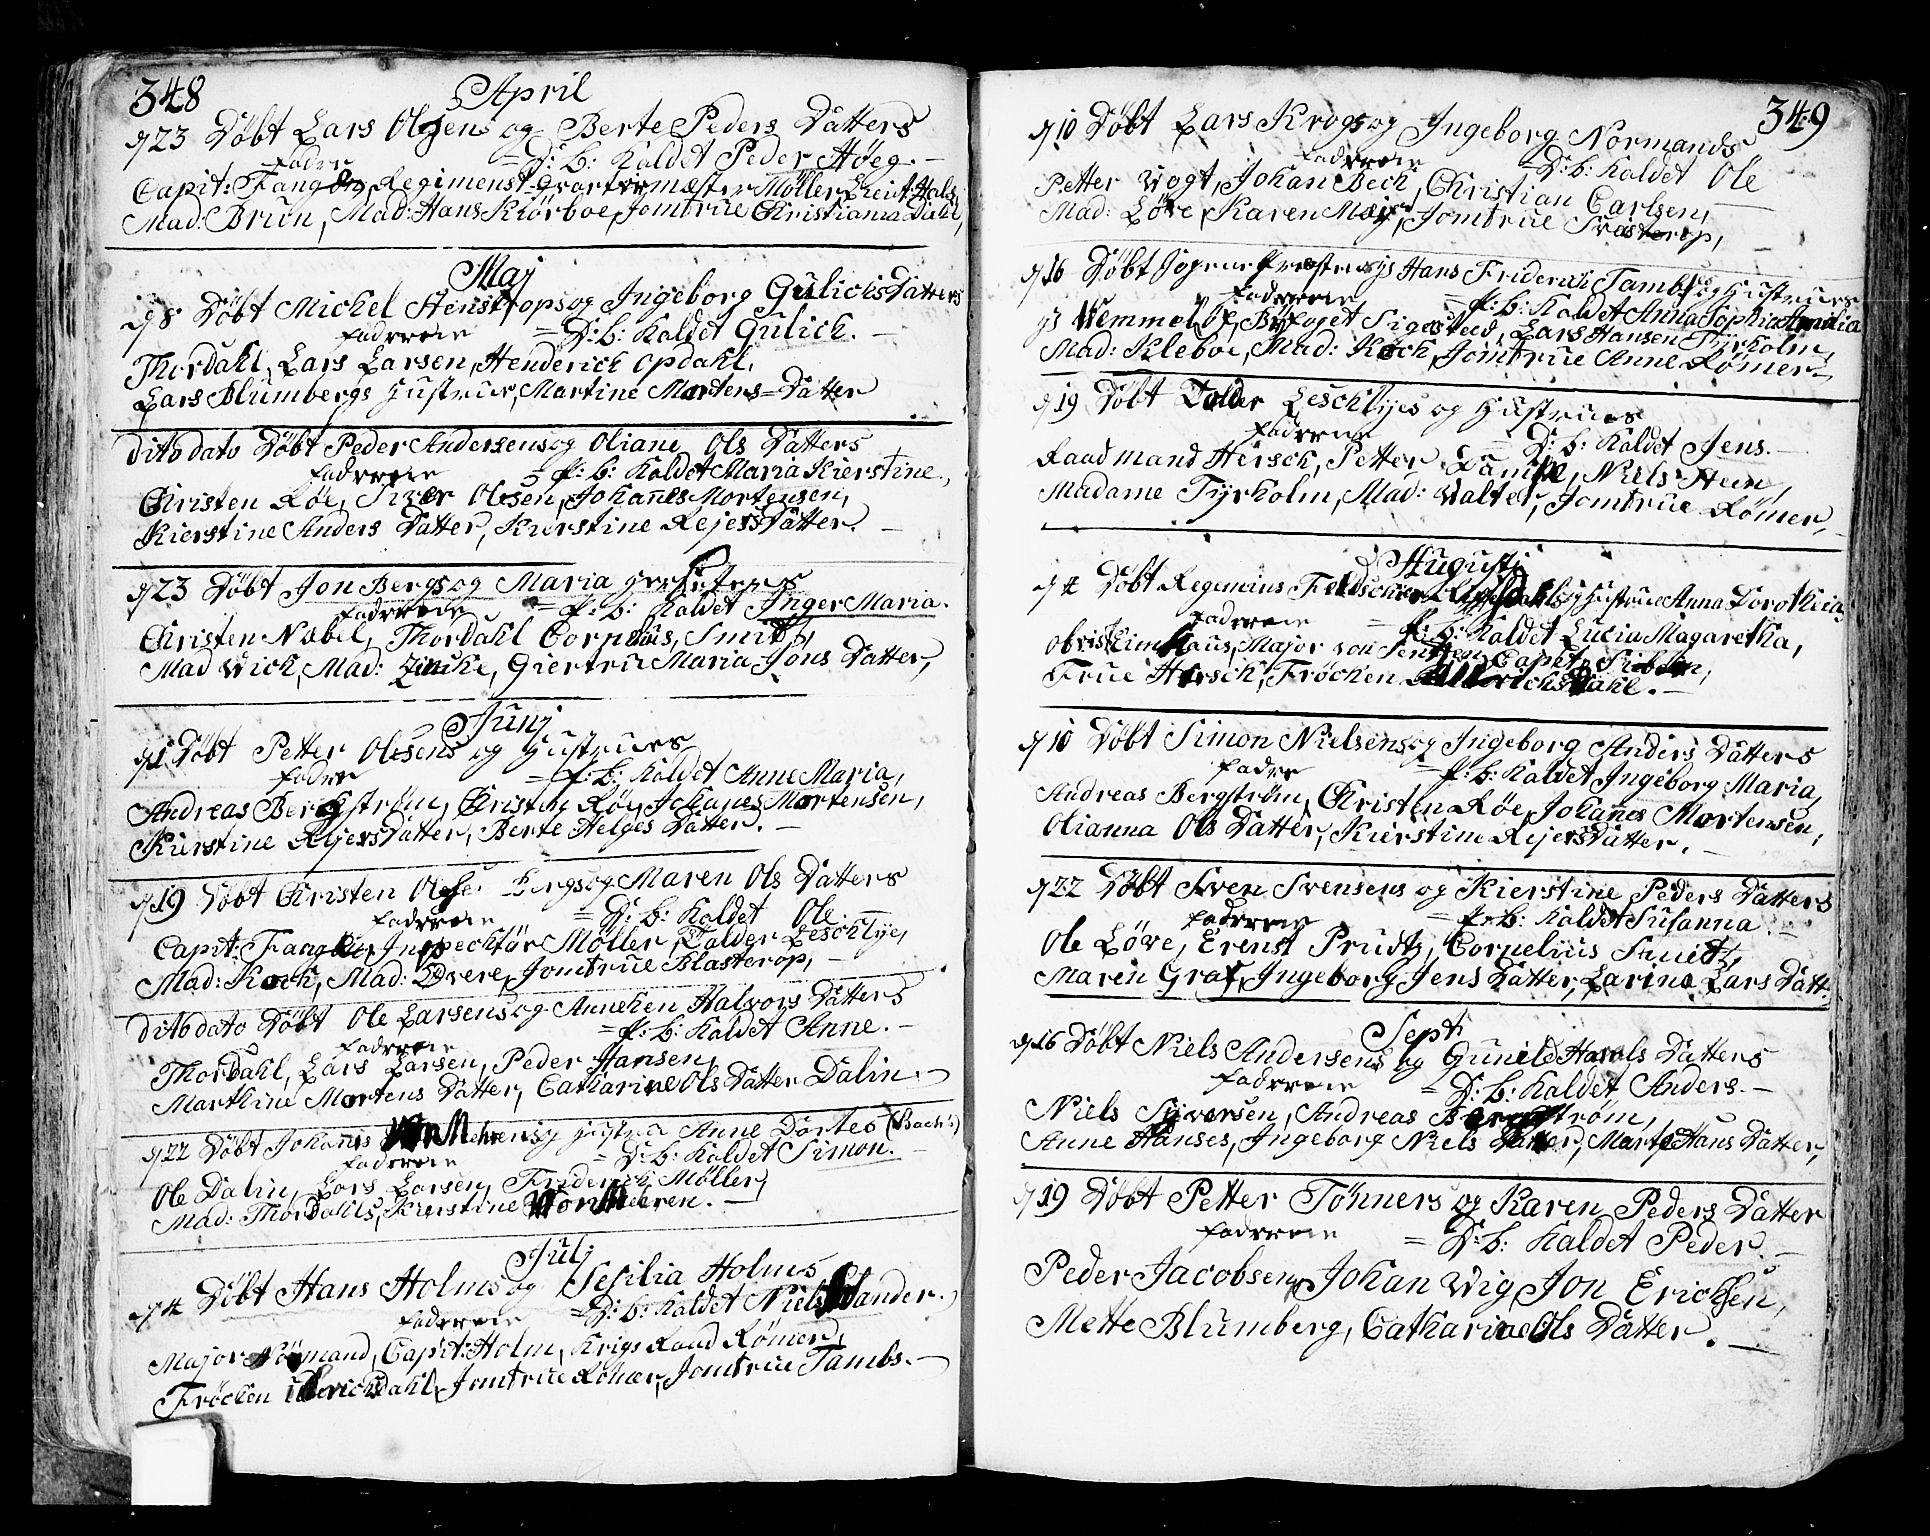 SAO, Fredrikstad prestekontor Kirkebøker, F/Fa/L0002: Ministerialbok nr. 2, 1750-1804, s. 348-349